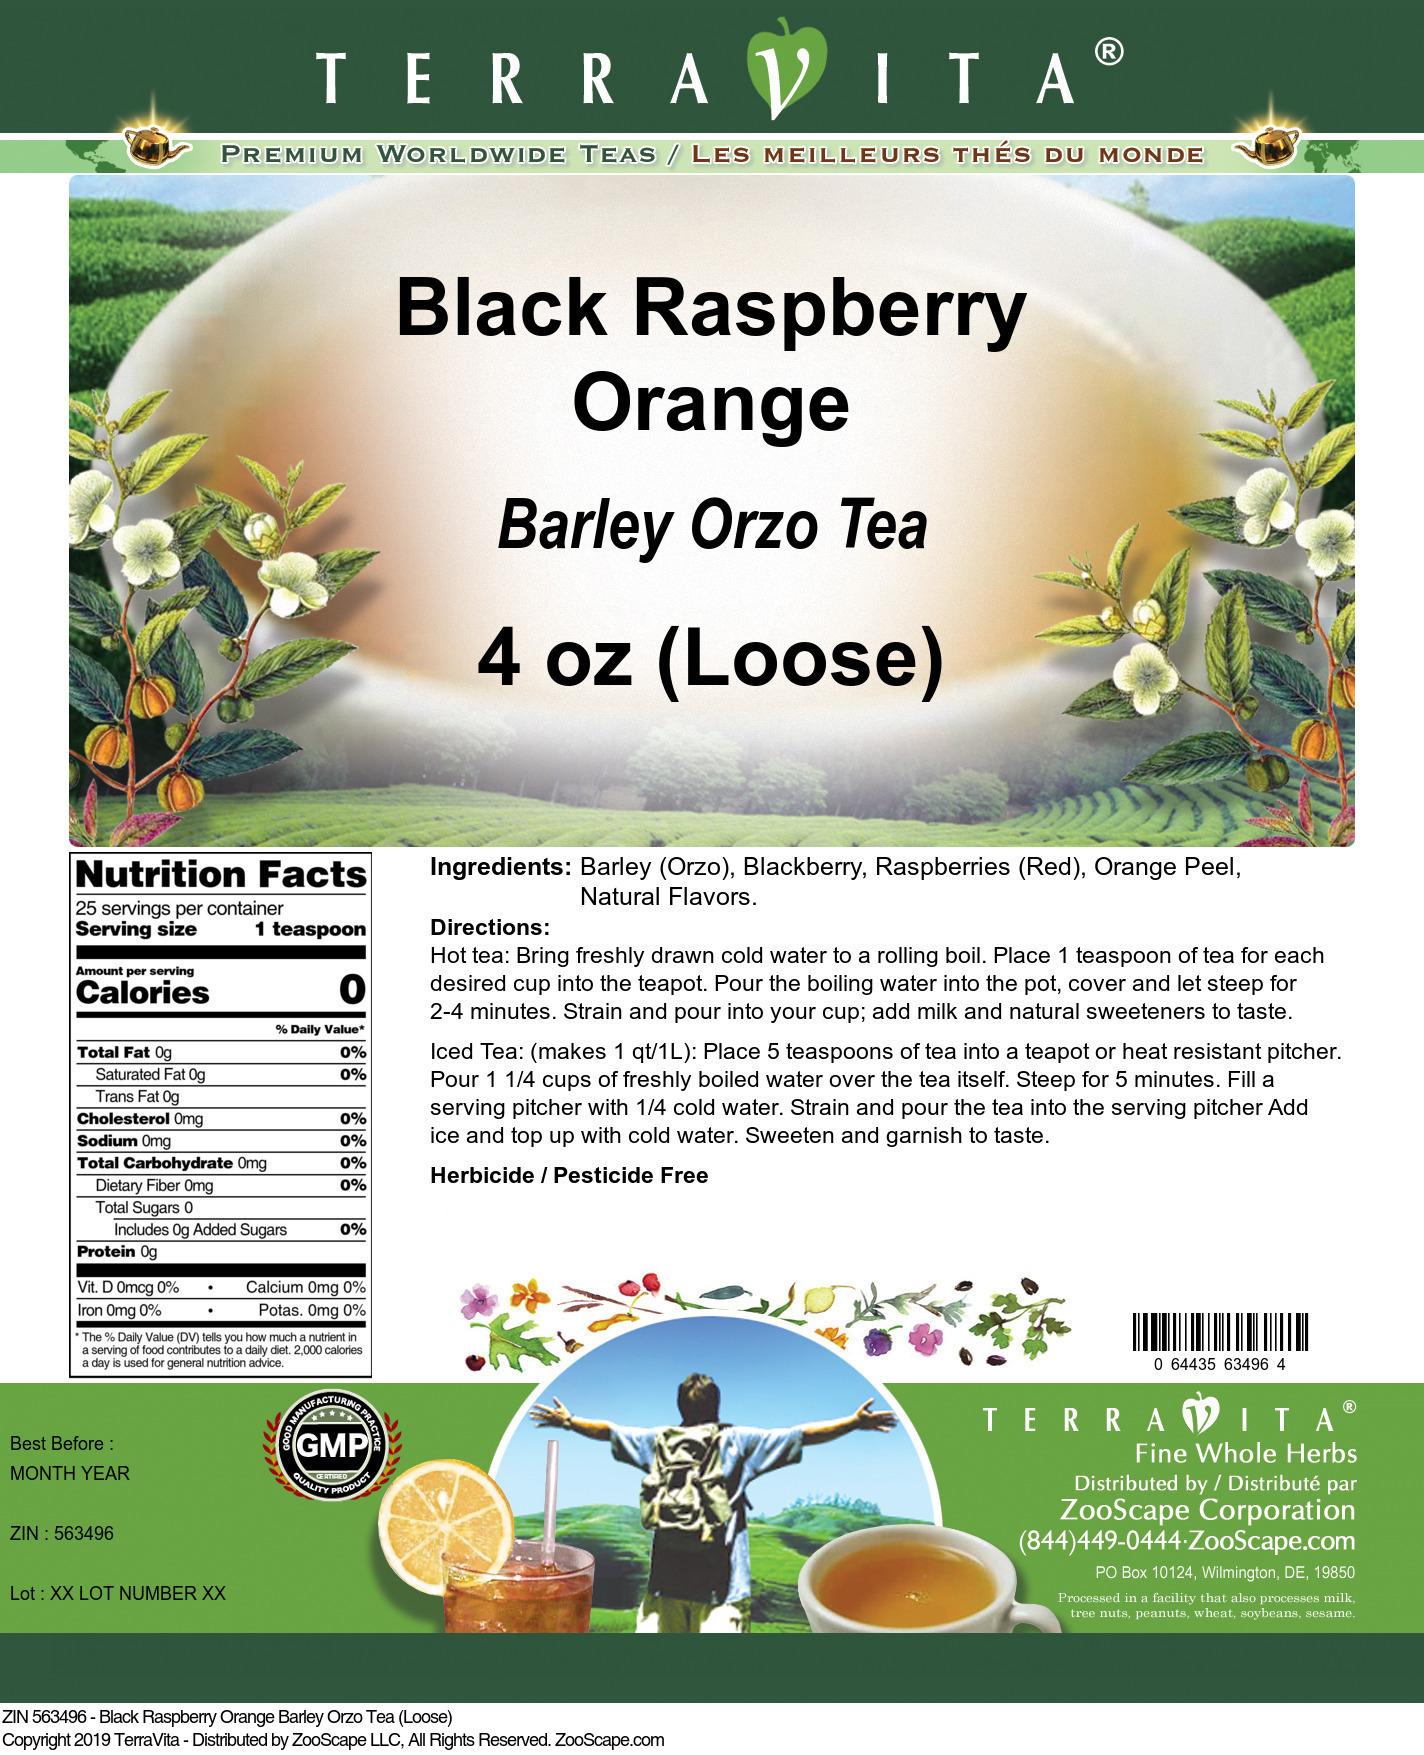 Black Raspberry Orange Barley Orzo Tea (Loose)